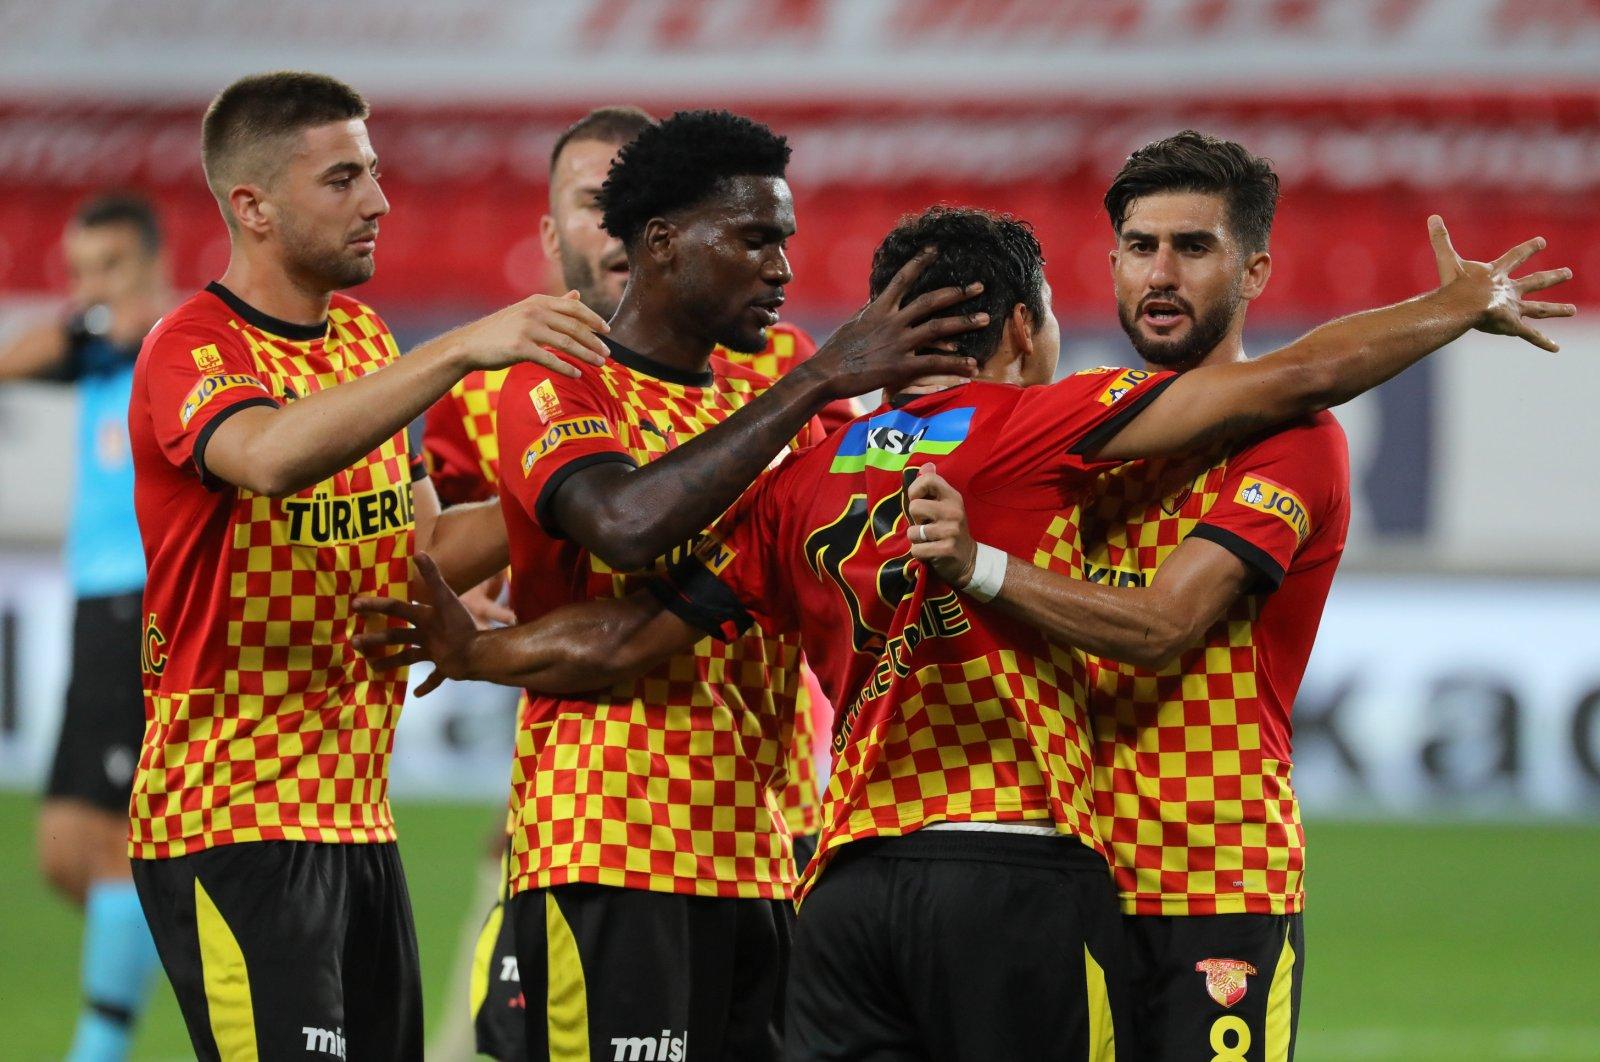 Göztepe players celebrate a goal during a Süper Lig match in Izmir, Turkey, Oct. 18, 2020. (AA Photo)